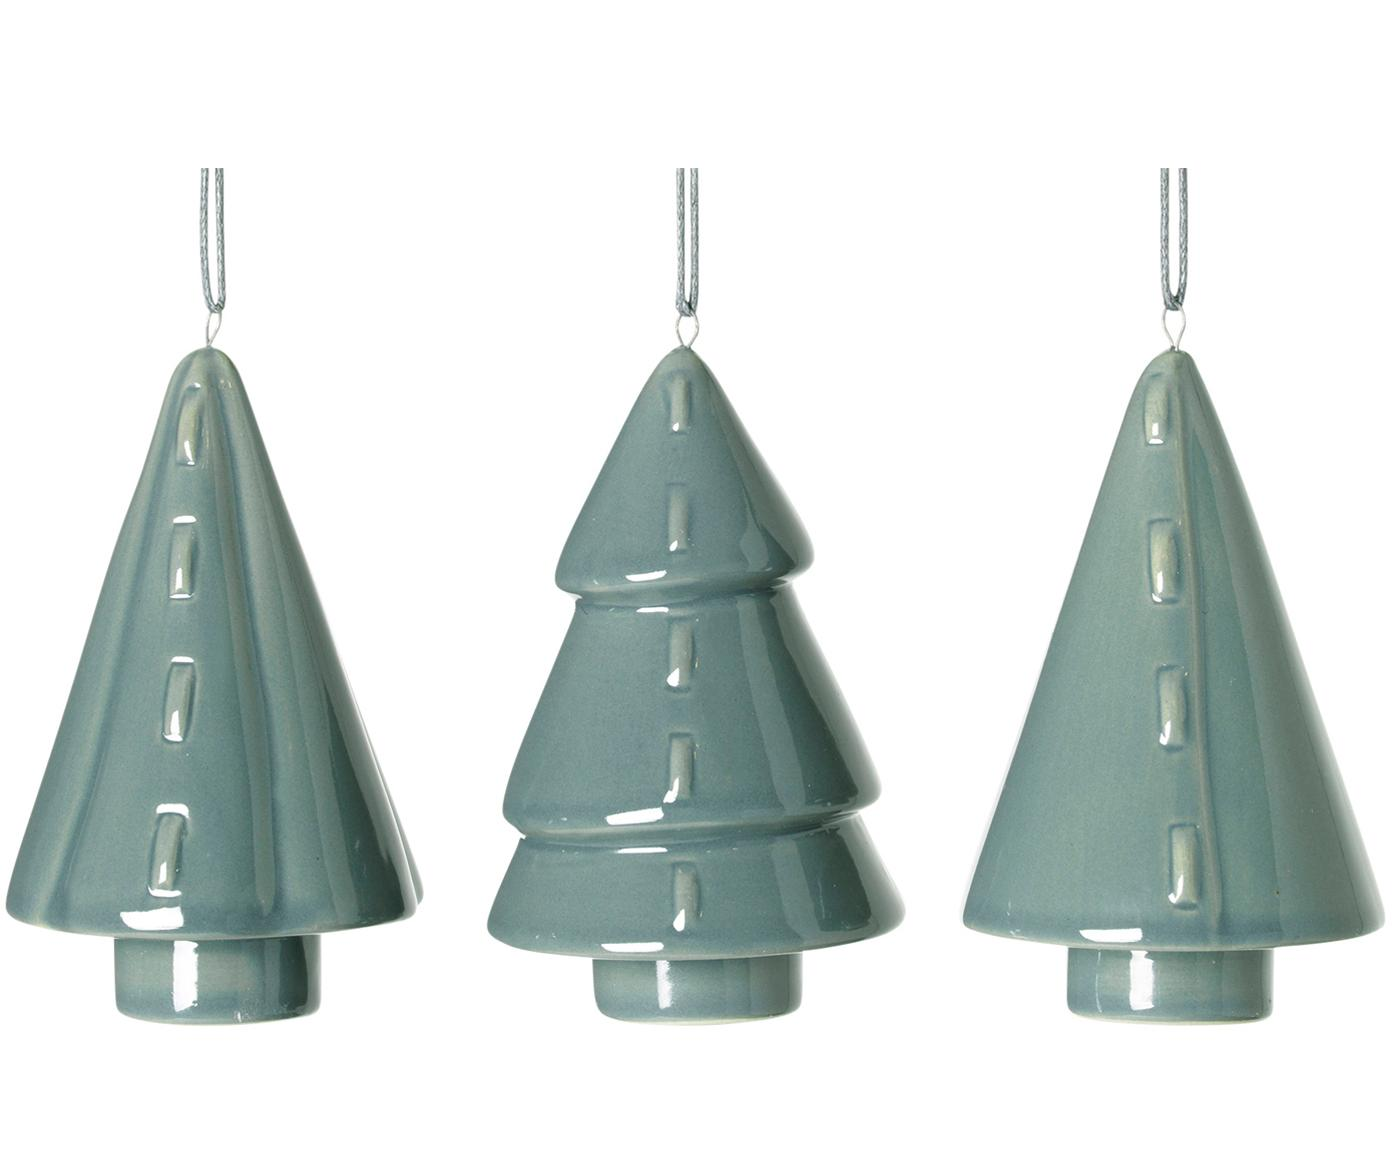 Baumanhänger-Set Trees, 3-tlg., Porzellan, Mintgrün, Ø 5 x H 9 cm